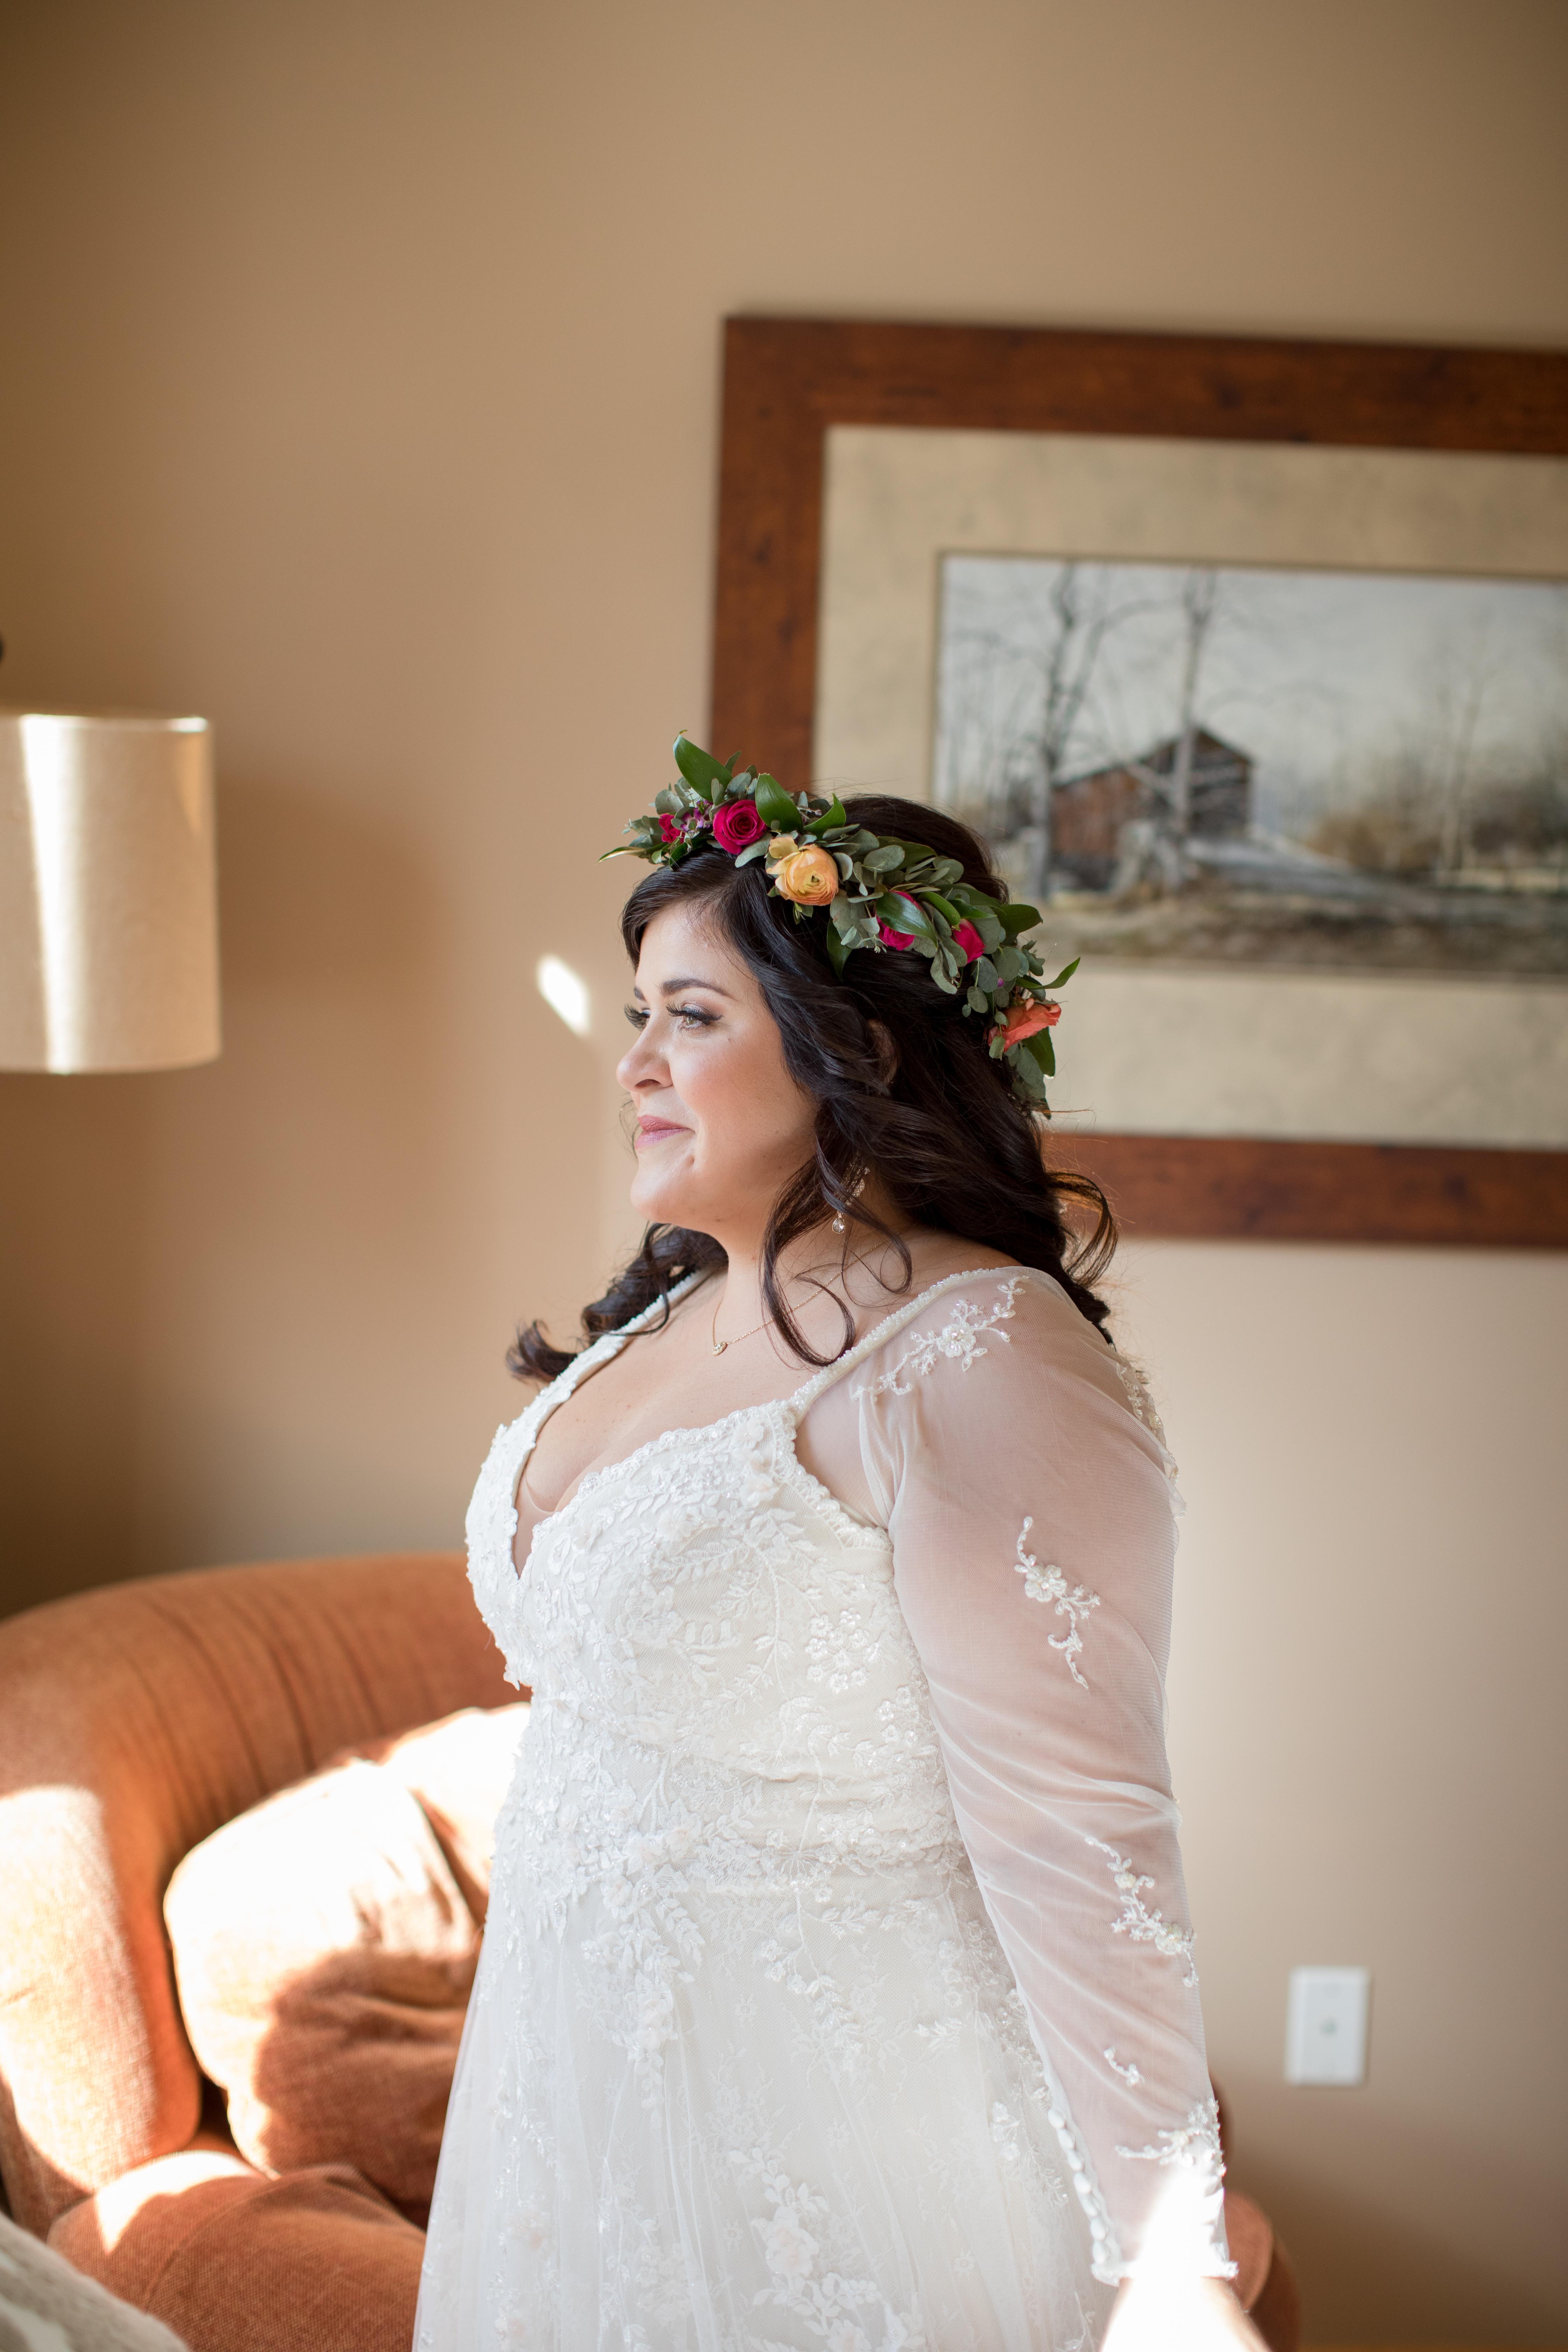 Private-Home-Rental-Wedding-VRBO-Fall-Breckenridge-Colorado-Bride-Getting-Ready